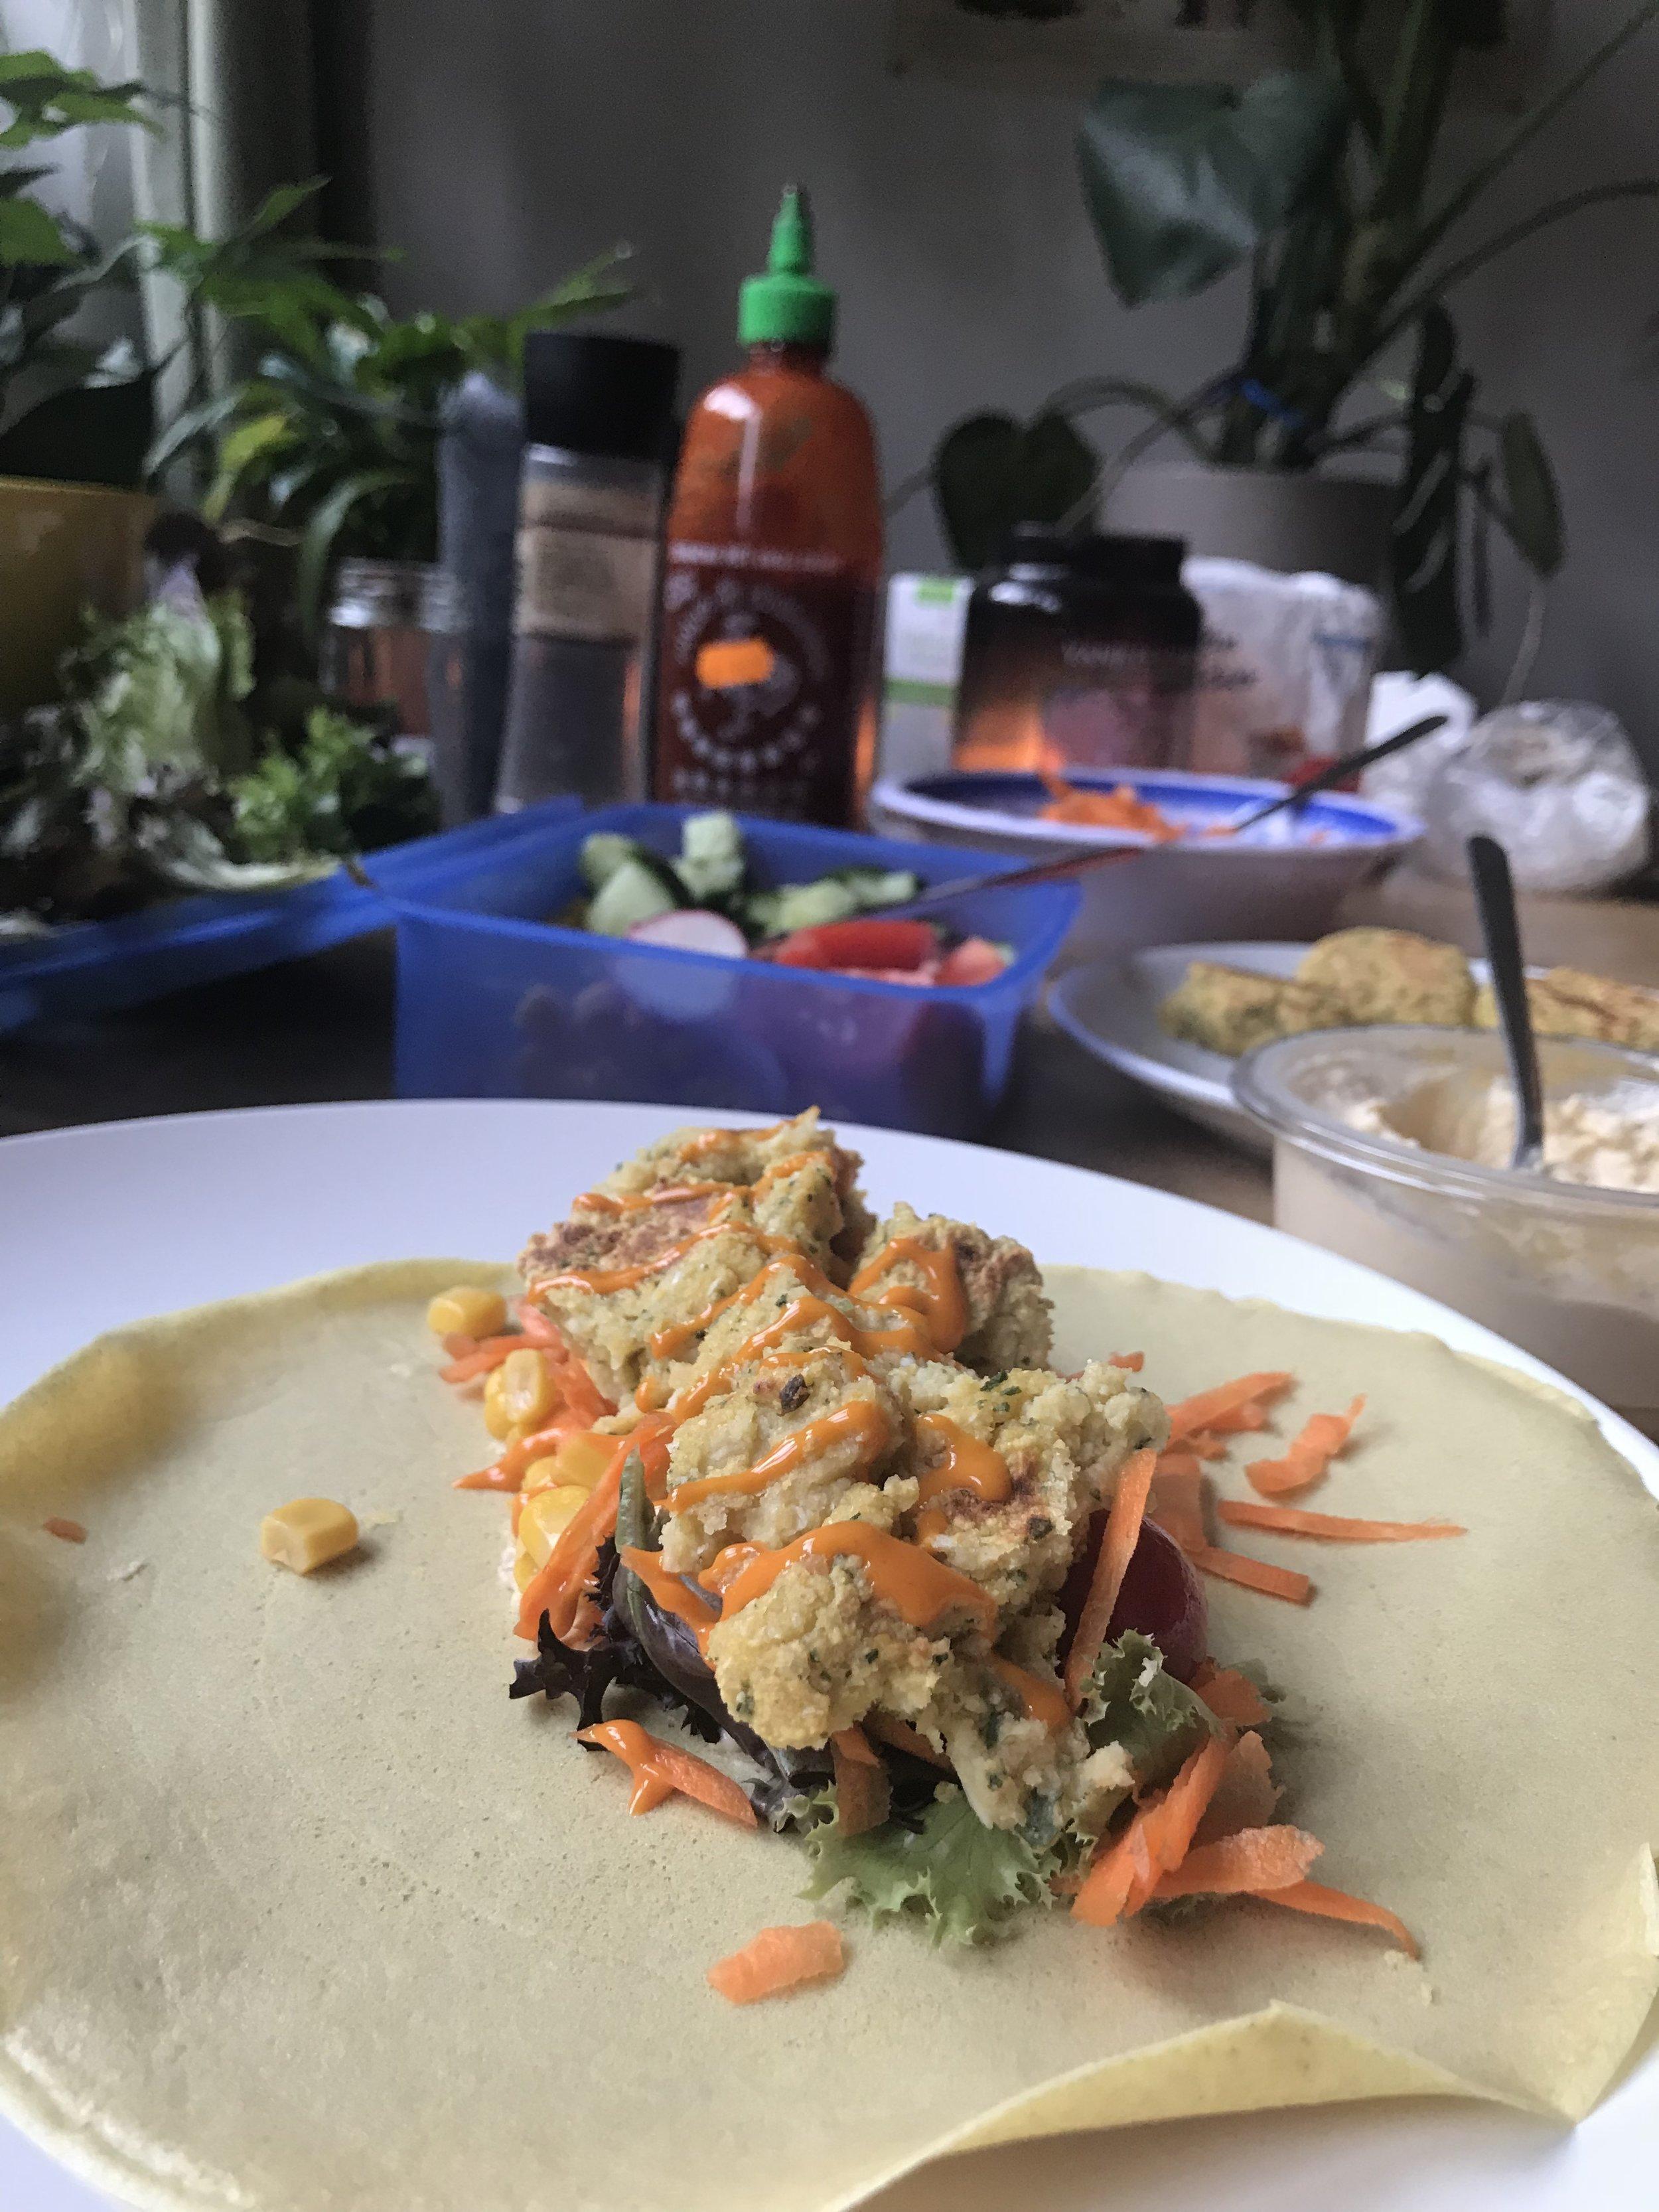 Homemade falafels & gluten free wraps with Kira